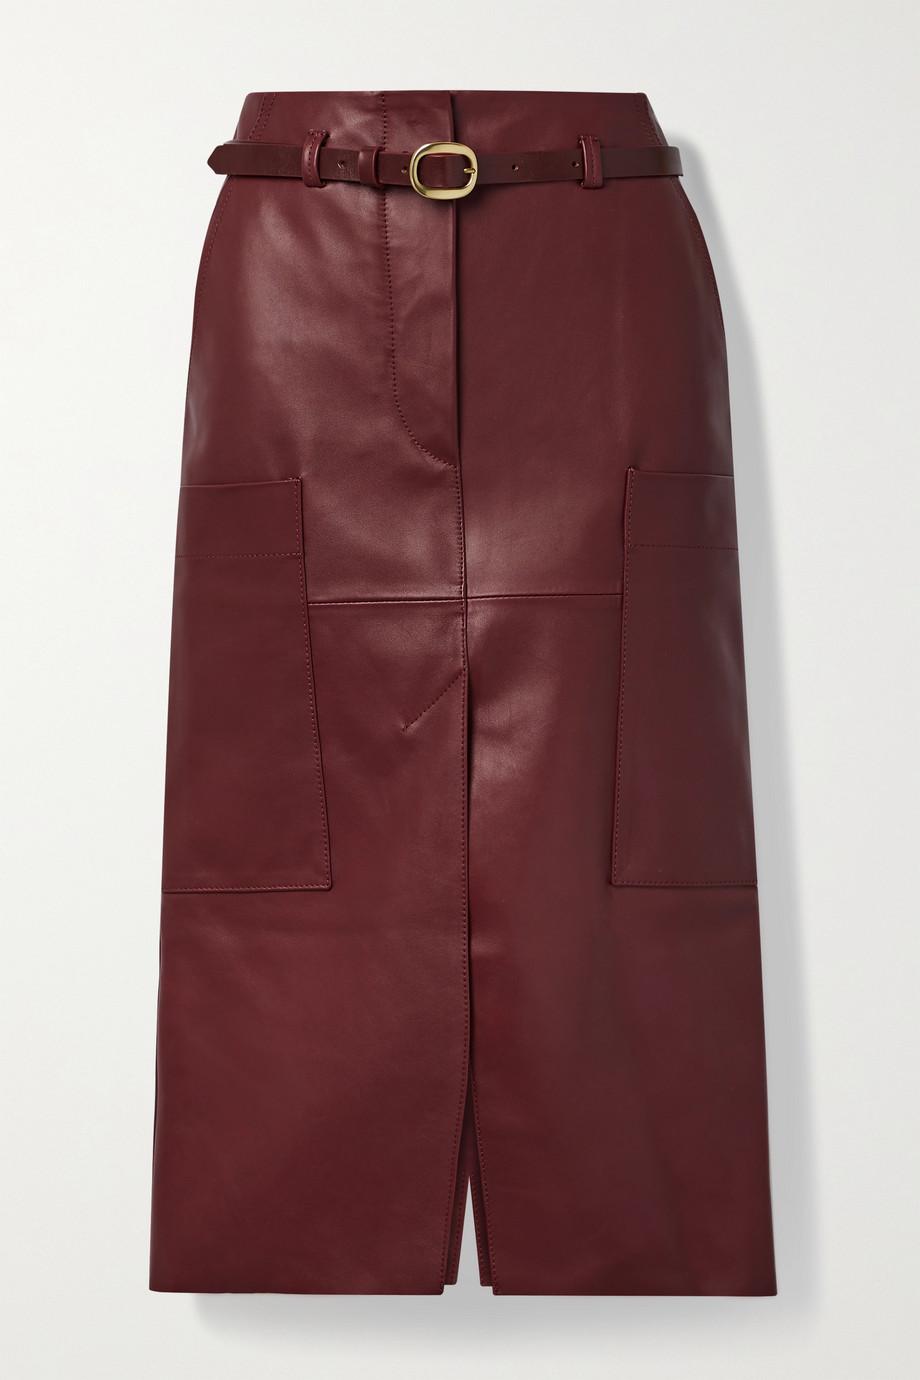 Petar Petrov Randy B belted leather midi skirt